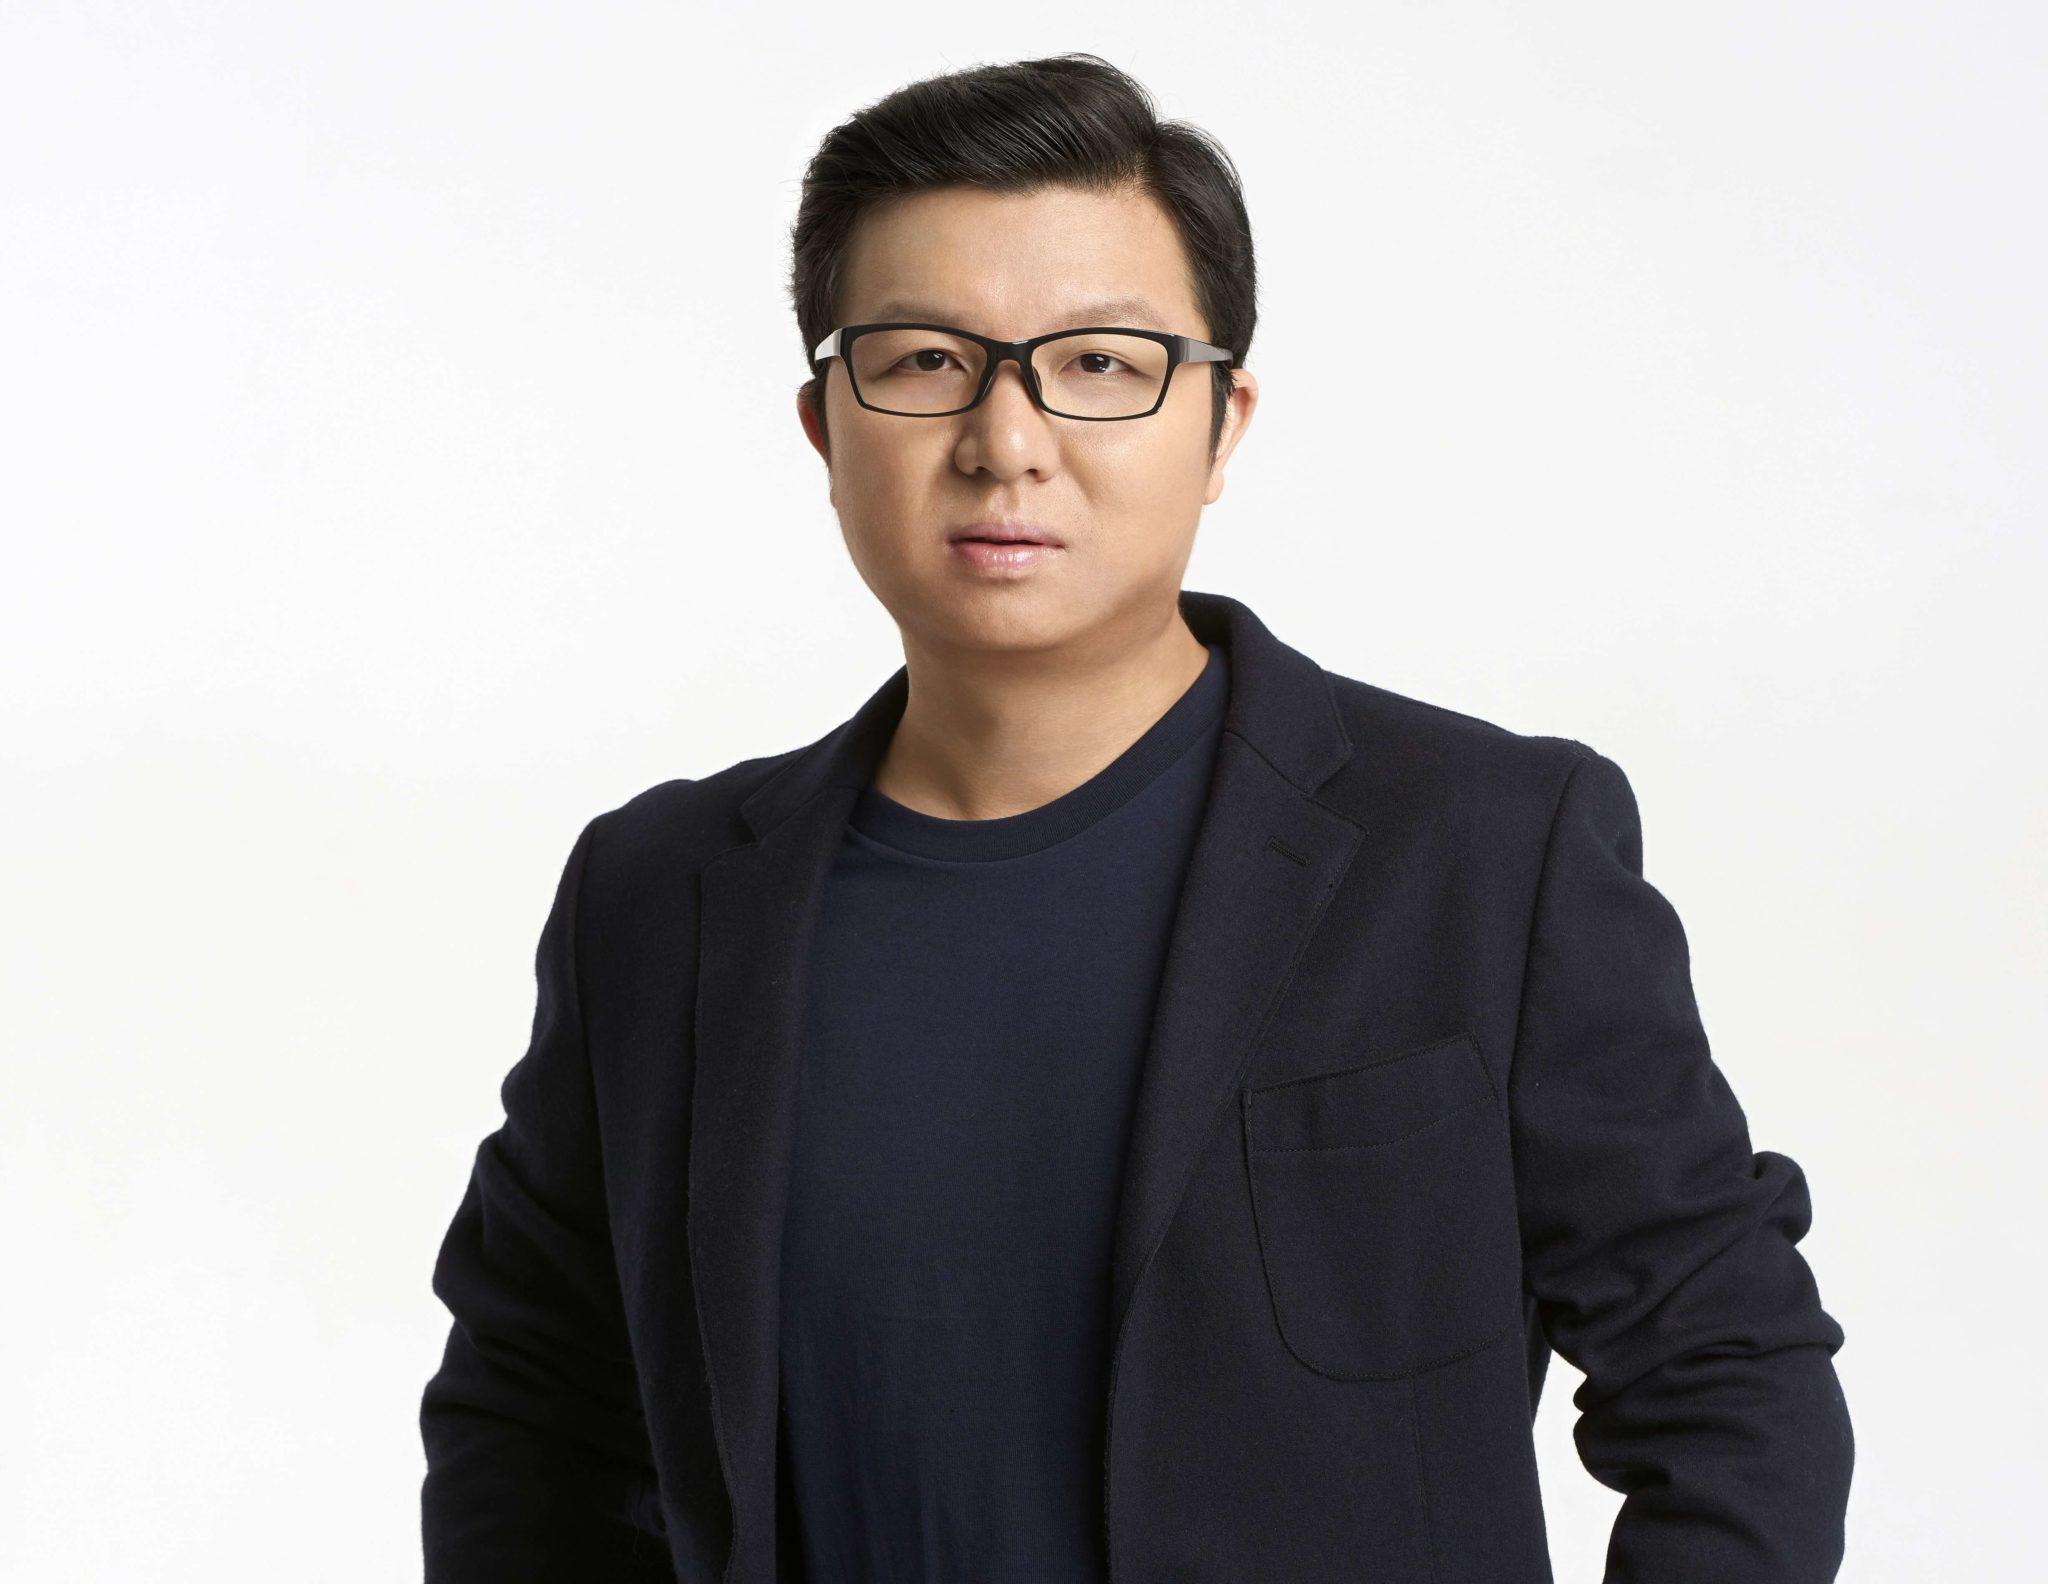 Su hua CEO of Kuaishou